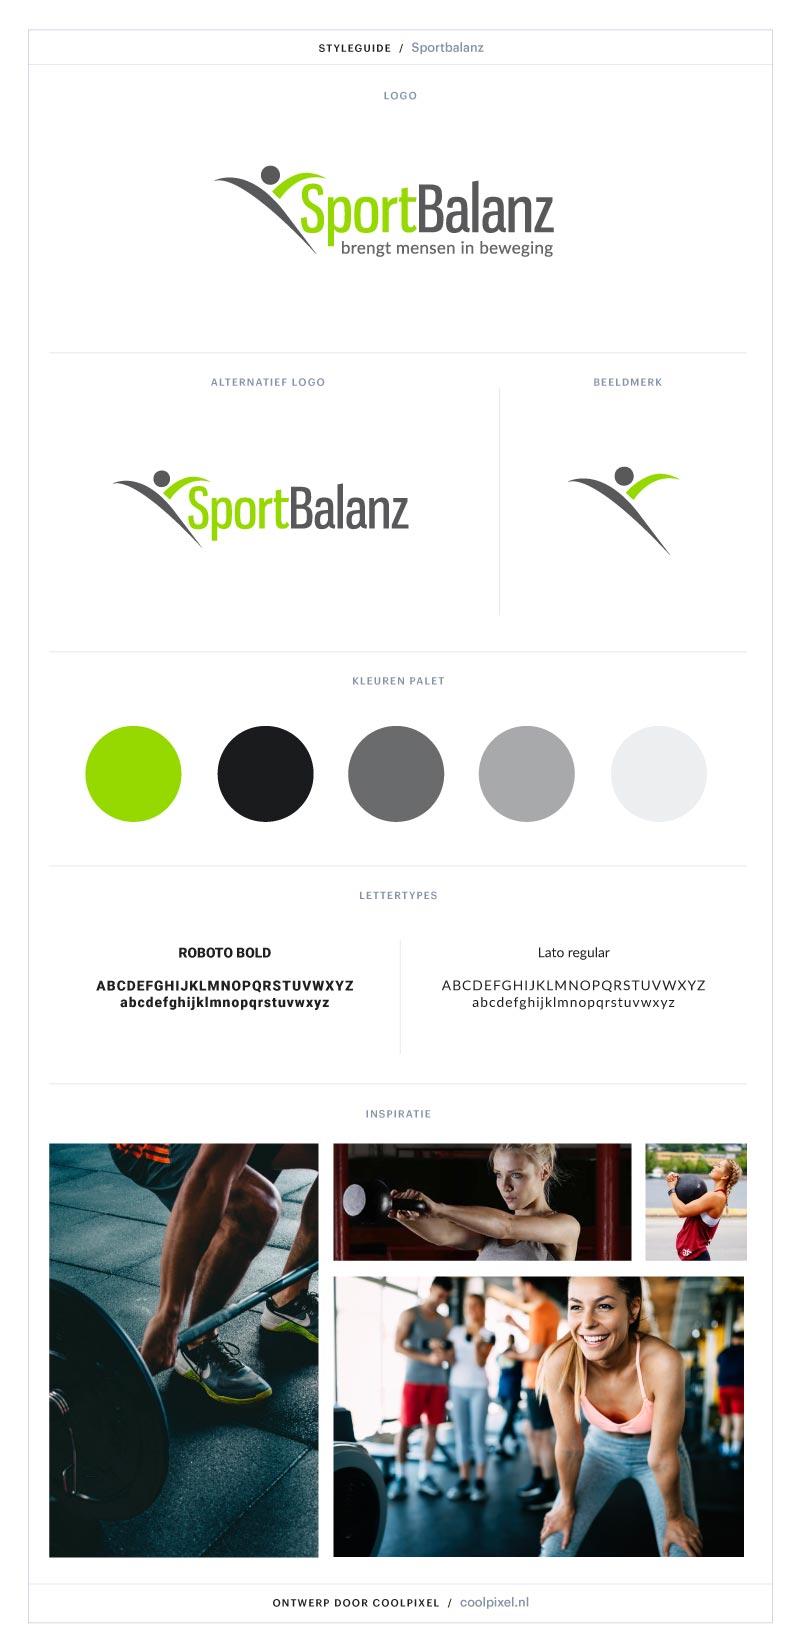 styleguide sportbalanz